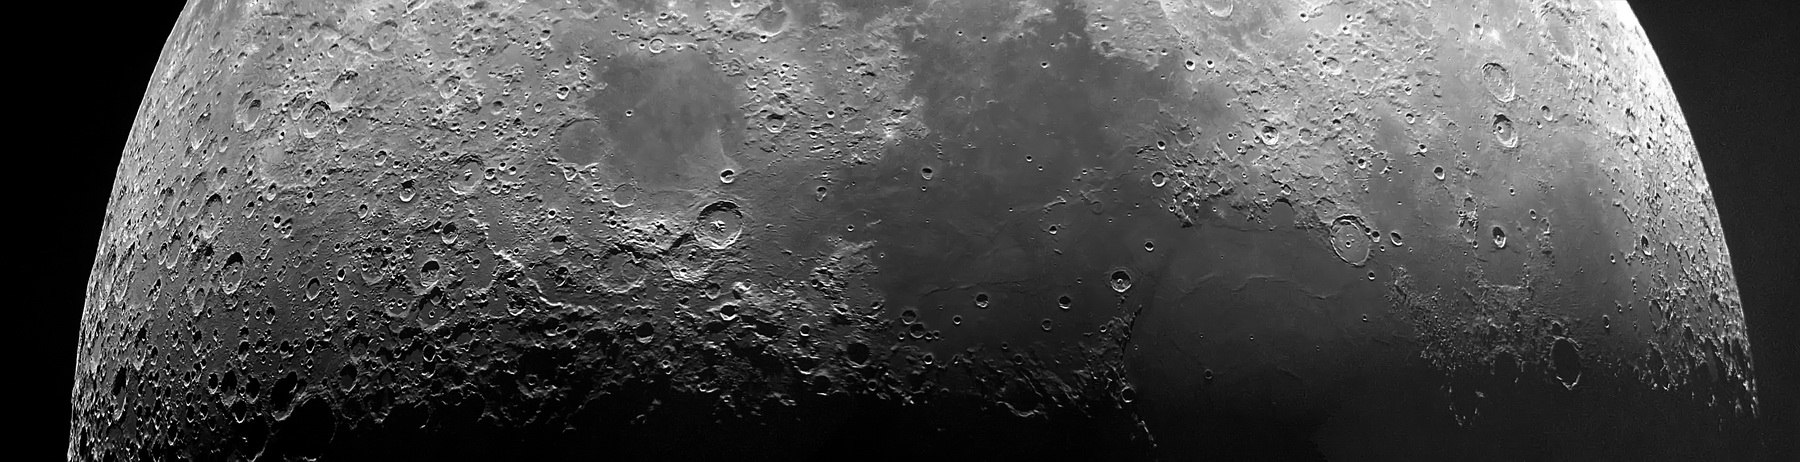 El terninador lunar